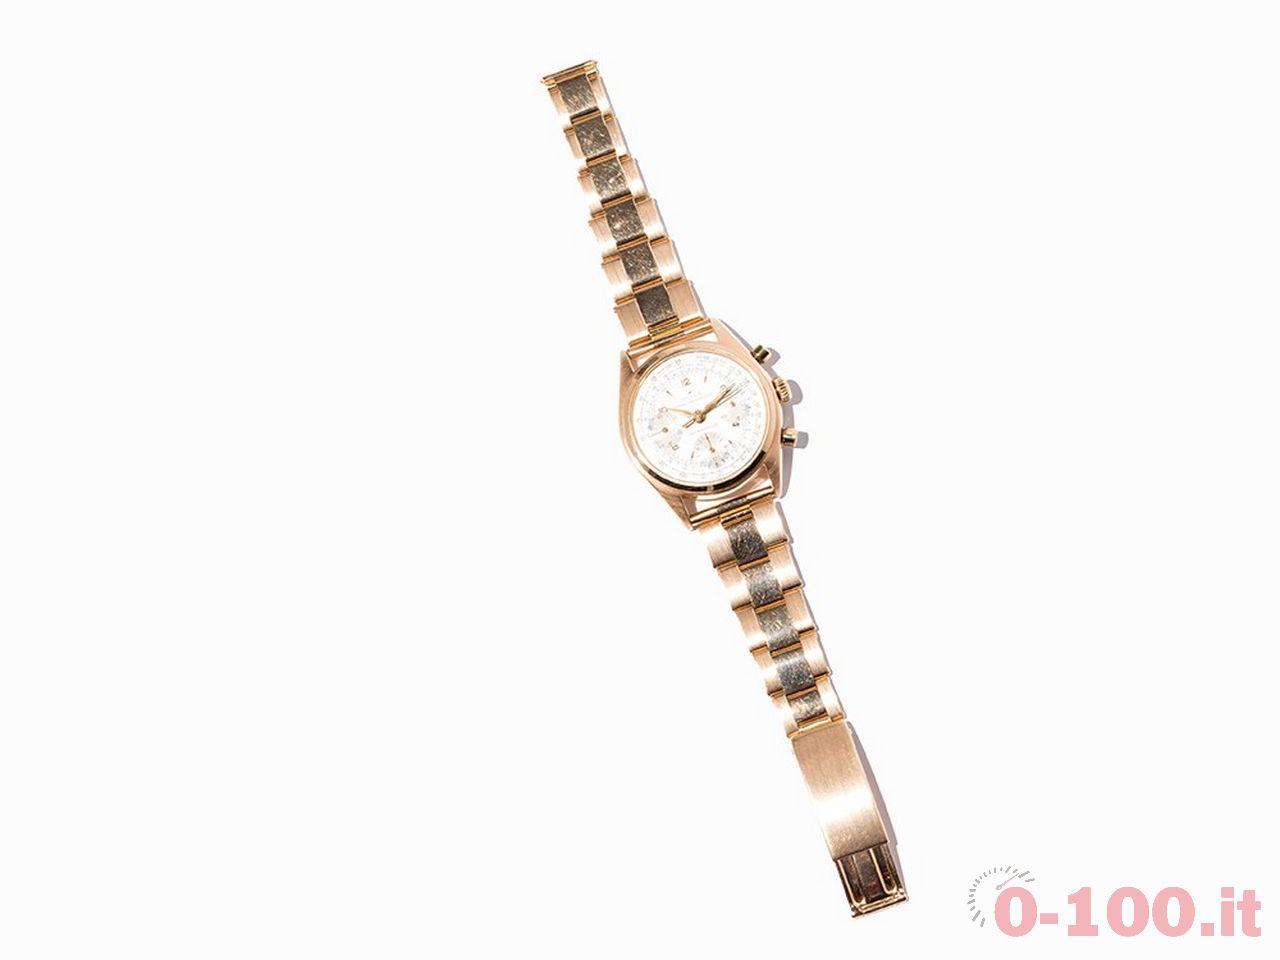 auctionata-rolex-oyster-chronograph-ref-6034-switzerland-around-1950-eric-claptons-collection_0-1007